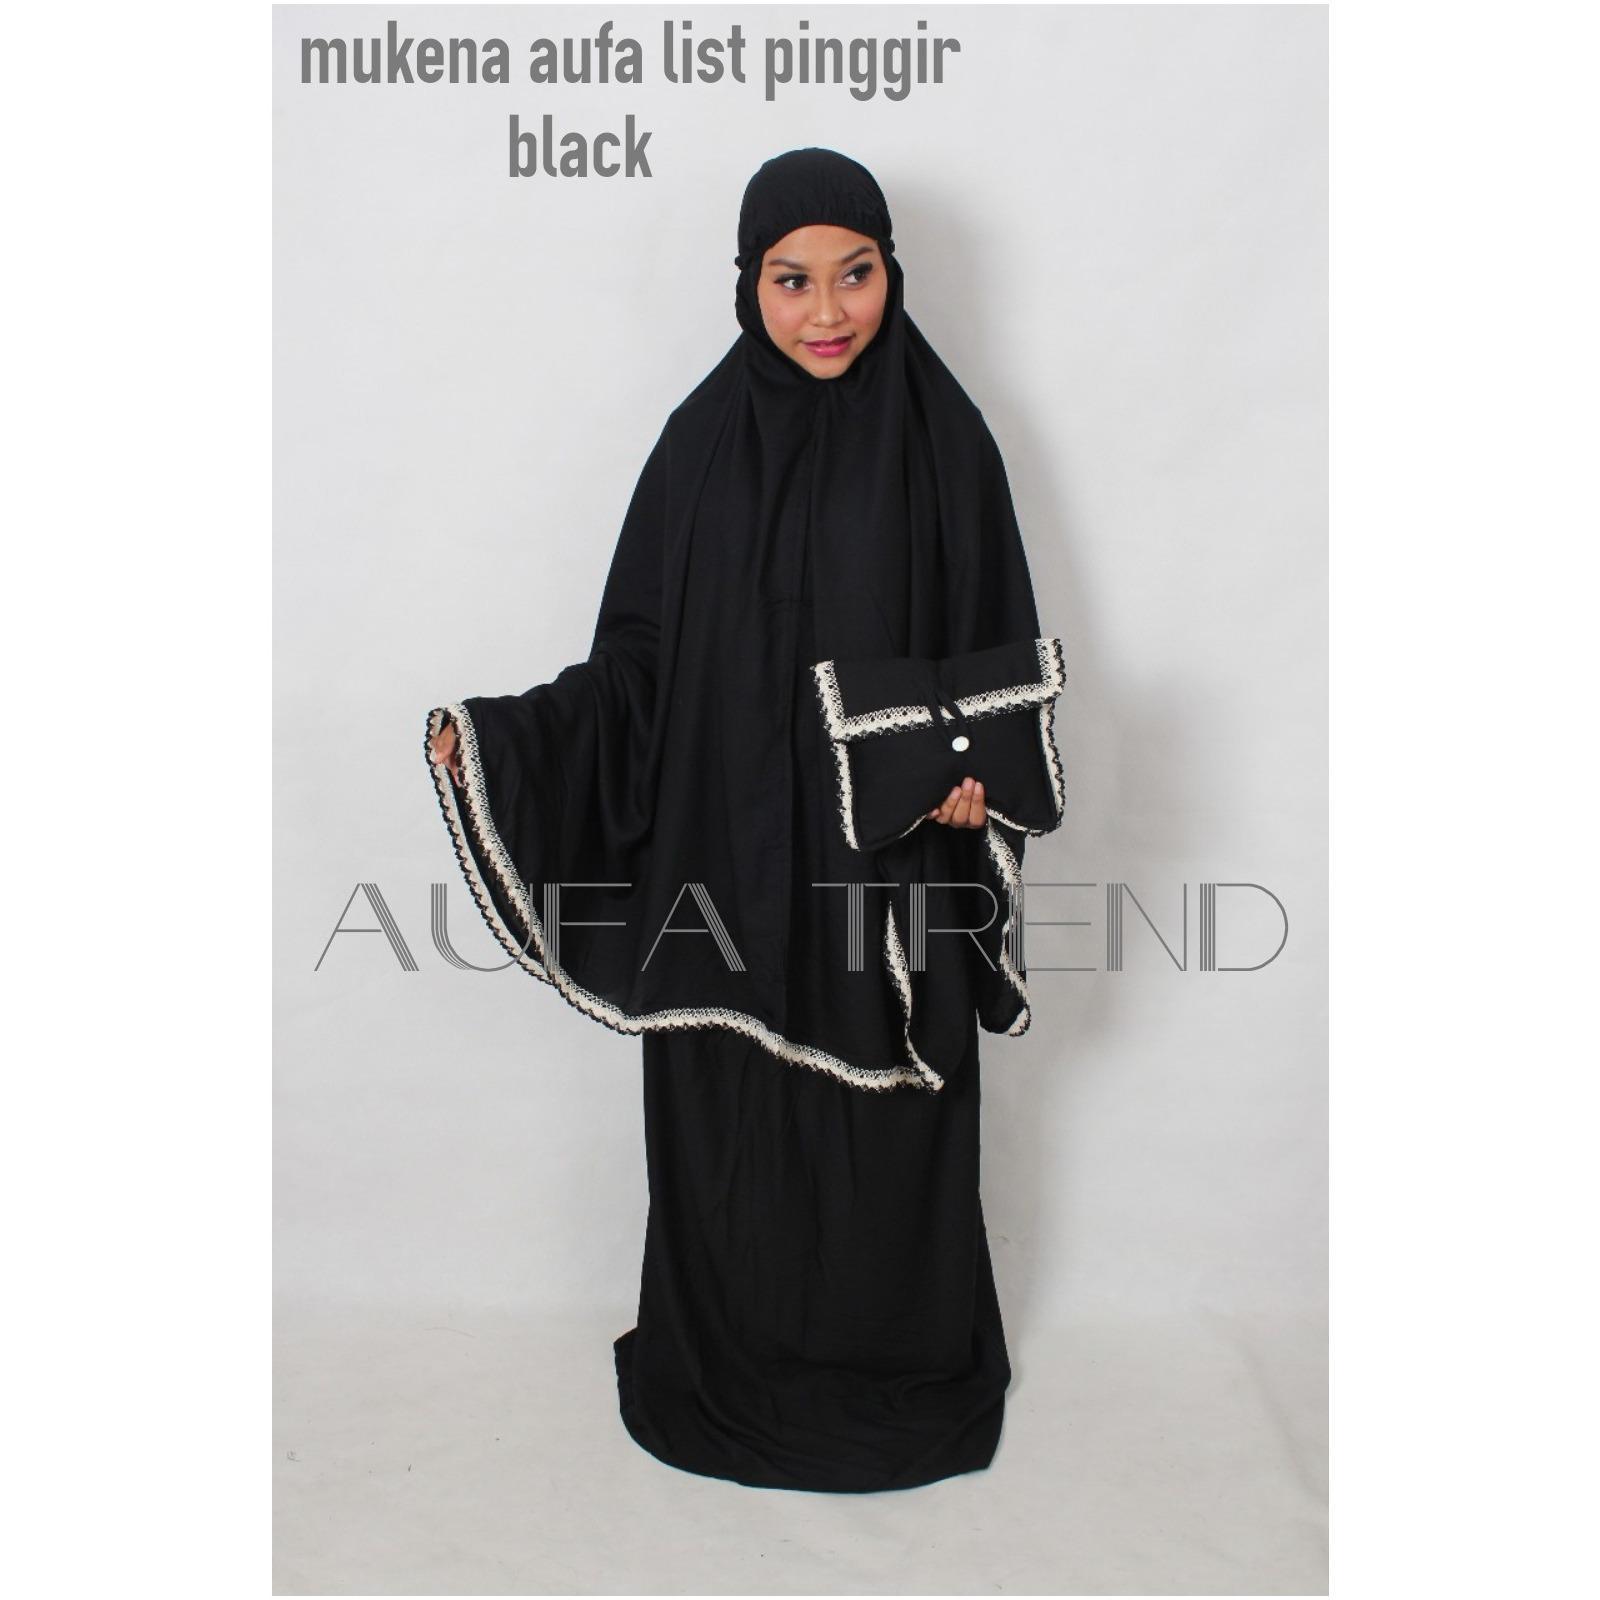 mukena muslimah remaja/mukena bali/mukena prada/mukena cotton rayon/mukena aufa renda pinggir bagus dan murah